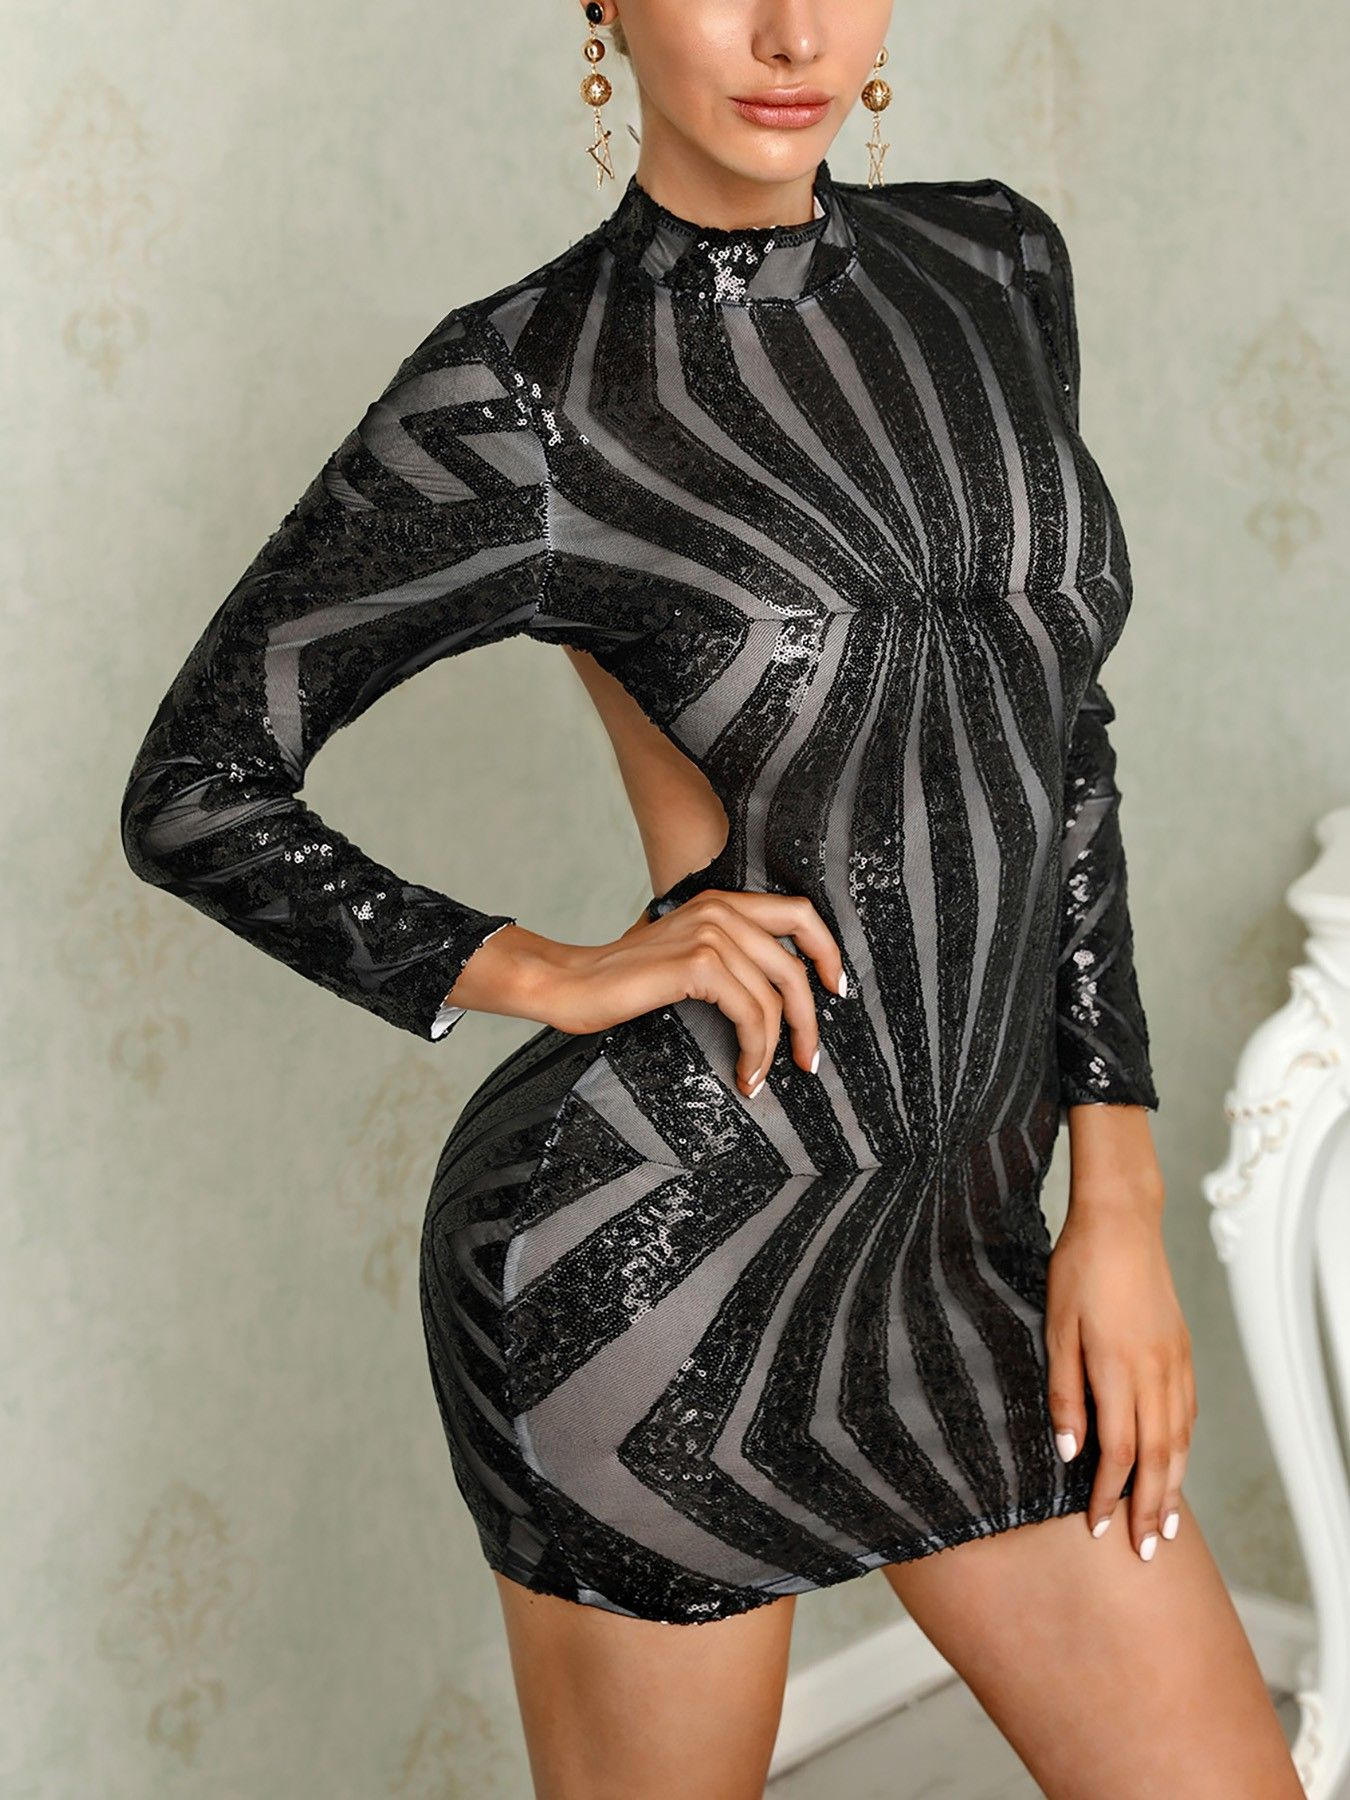 e33ae8ad8598 boutiquefeel / Shinny Open Back Long Sleeve Bodycon Mini Dress ...